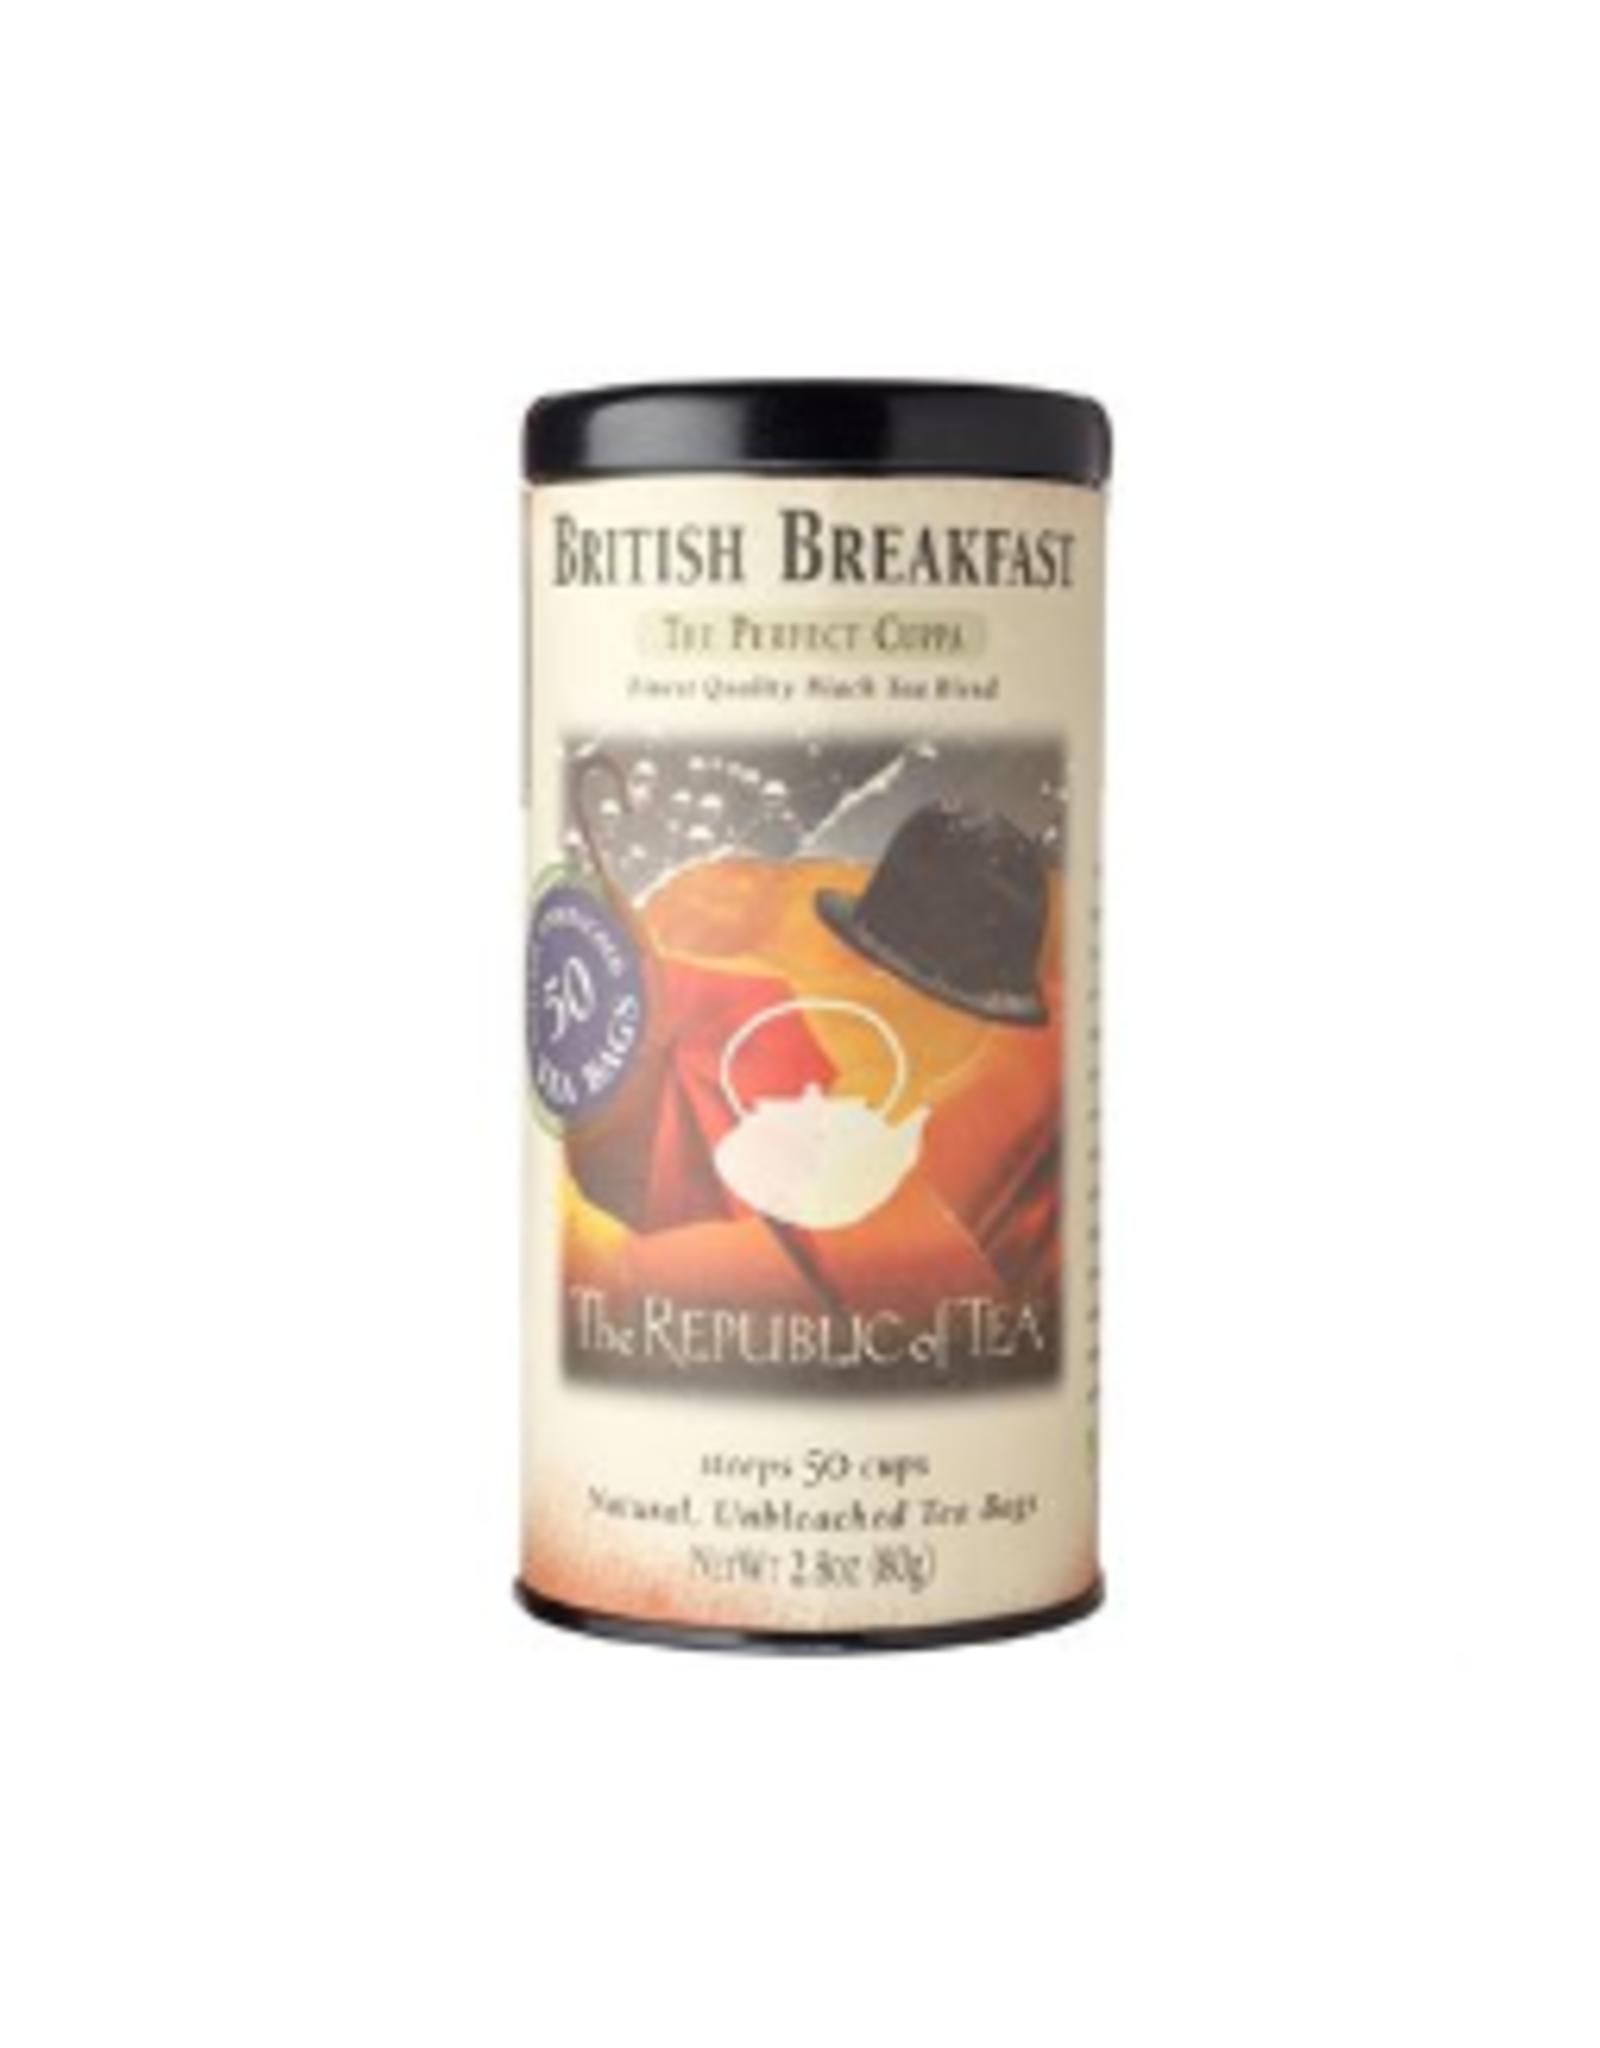 The Republic of Tea British Breakfast Black Tea, 50 Bag Tin